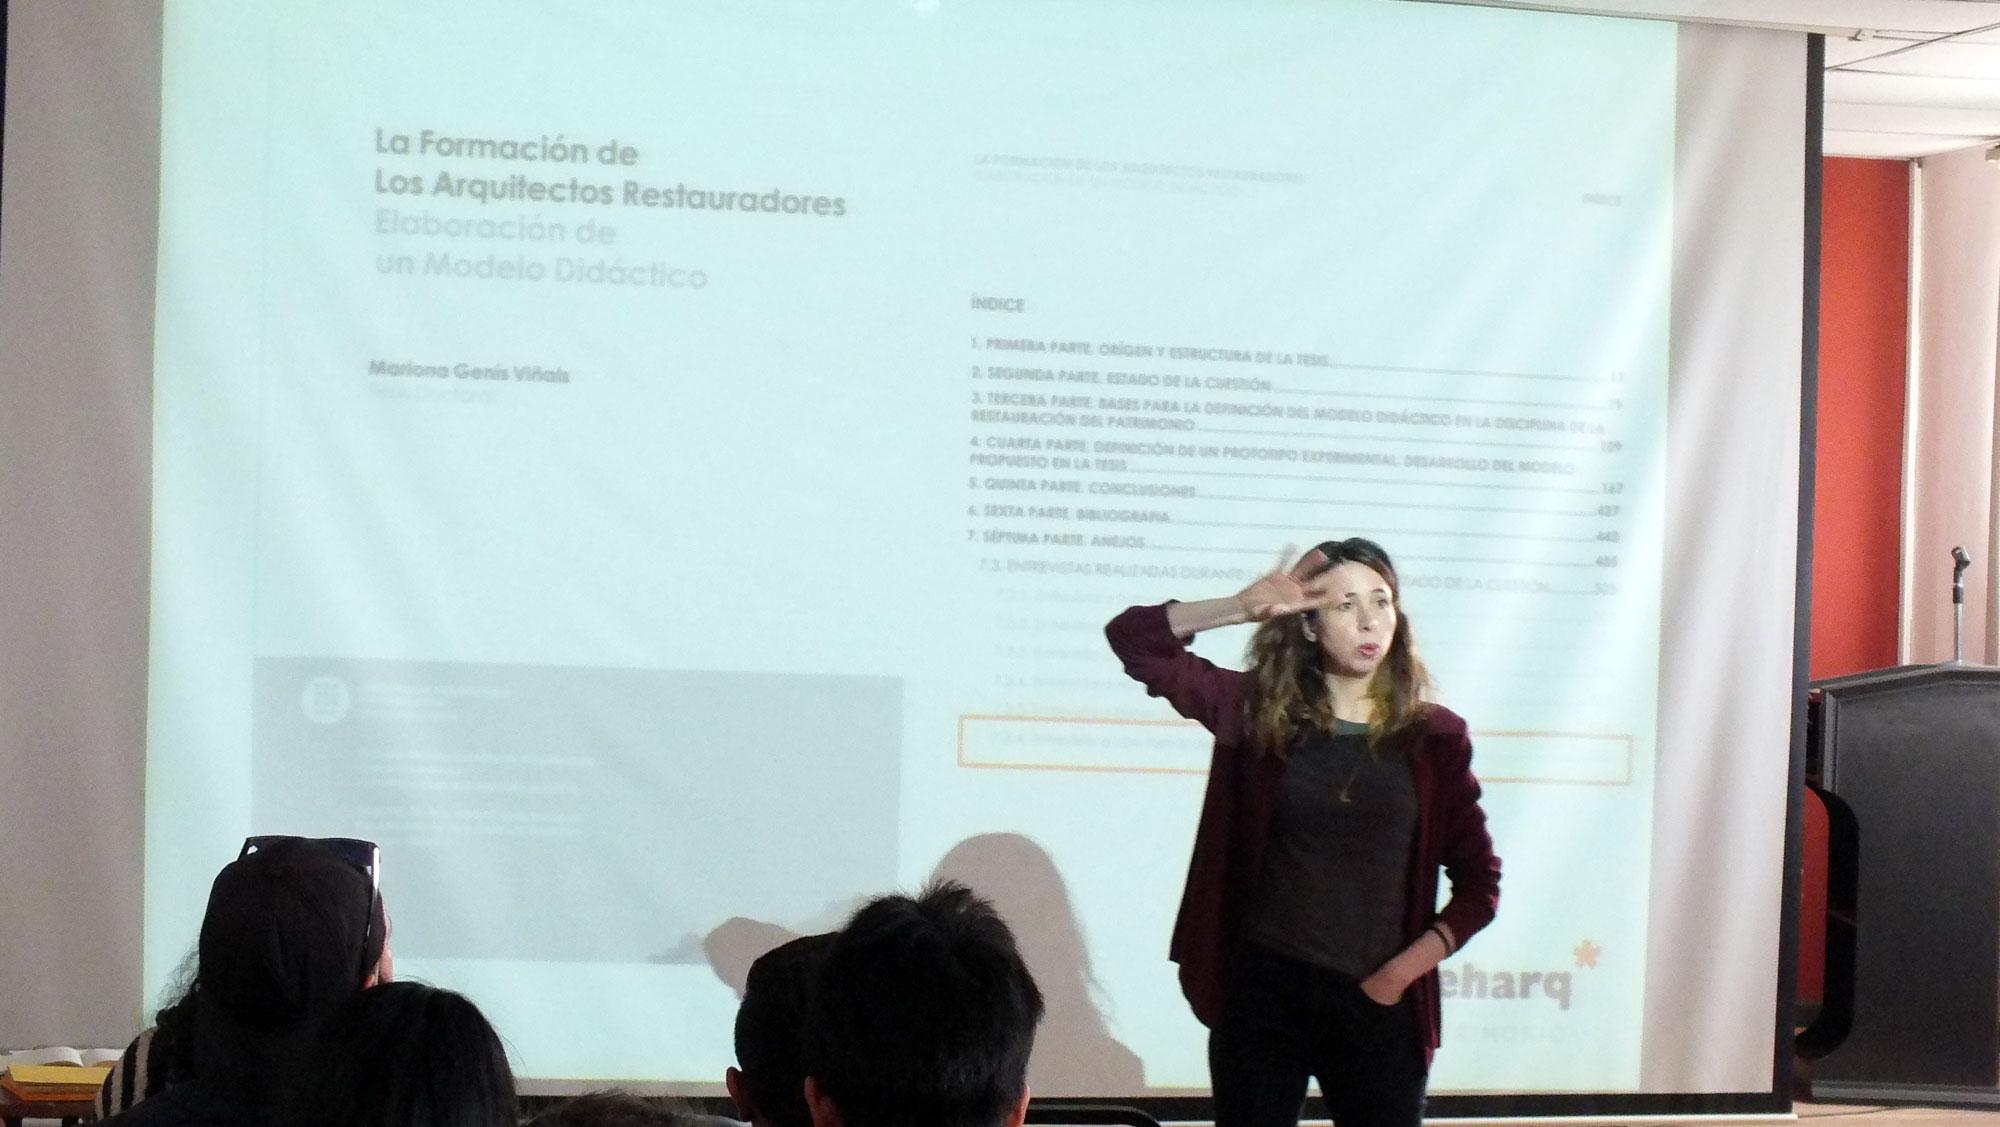 patrimonio_creatividad_valores_workshop_taller_reharq_universidad_cuenca_ecuador_tesis mariona genís